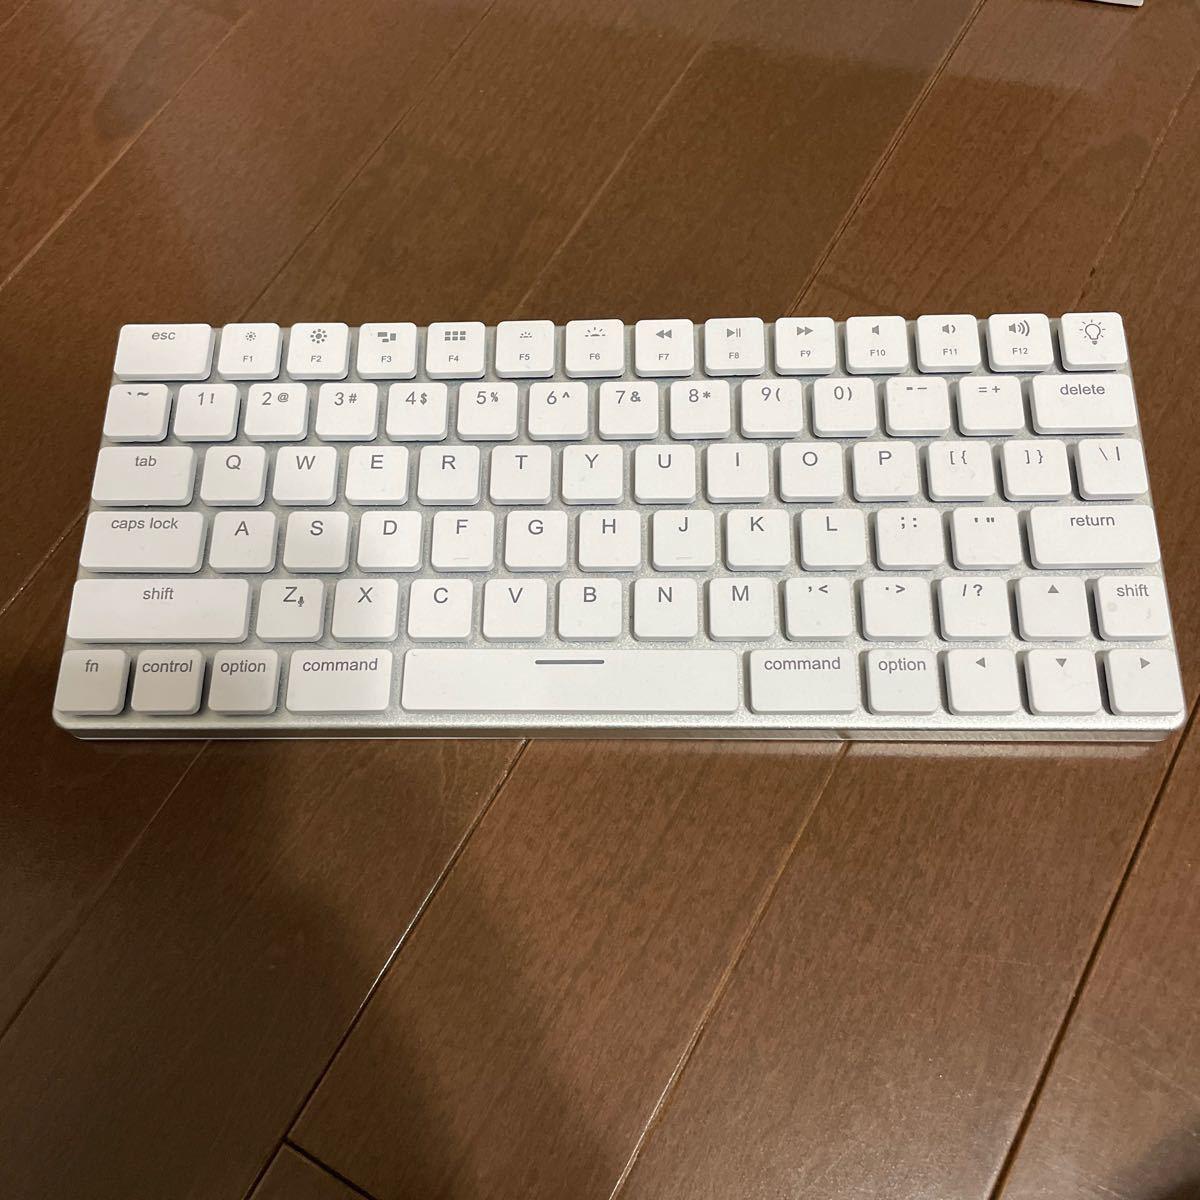 Vinpok Taptek ワイヤレスキーボード Mac配列 白